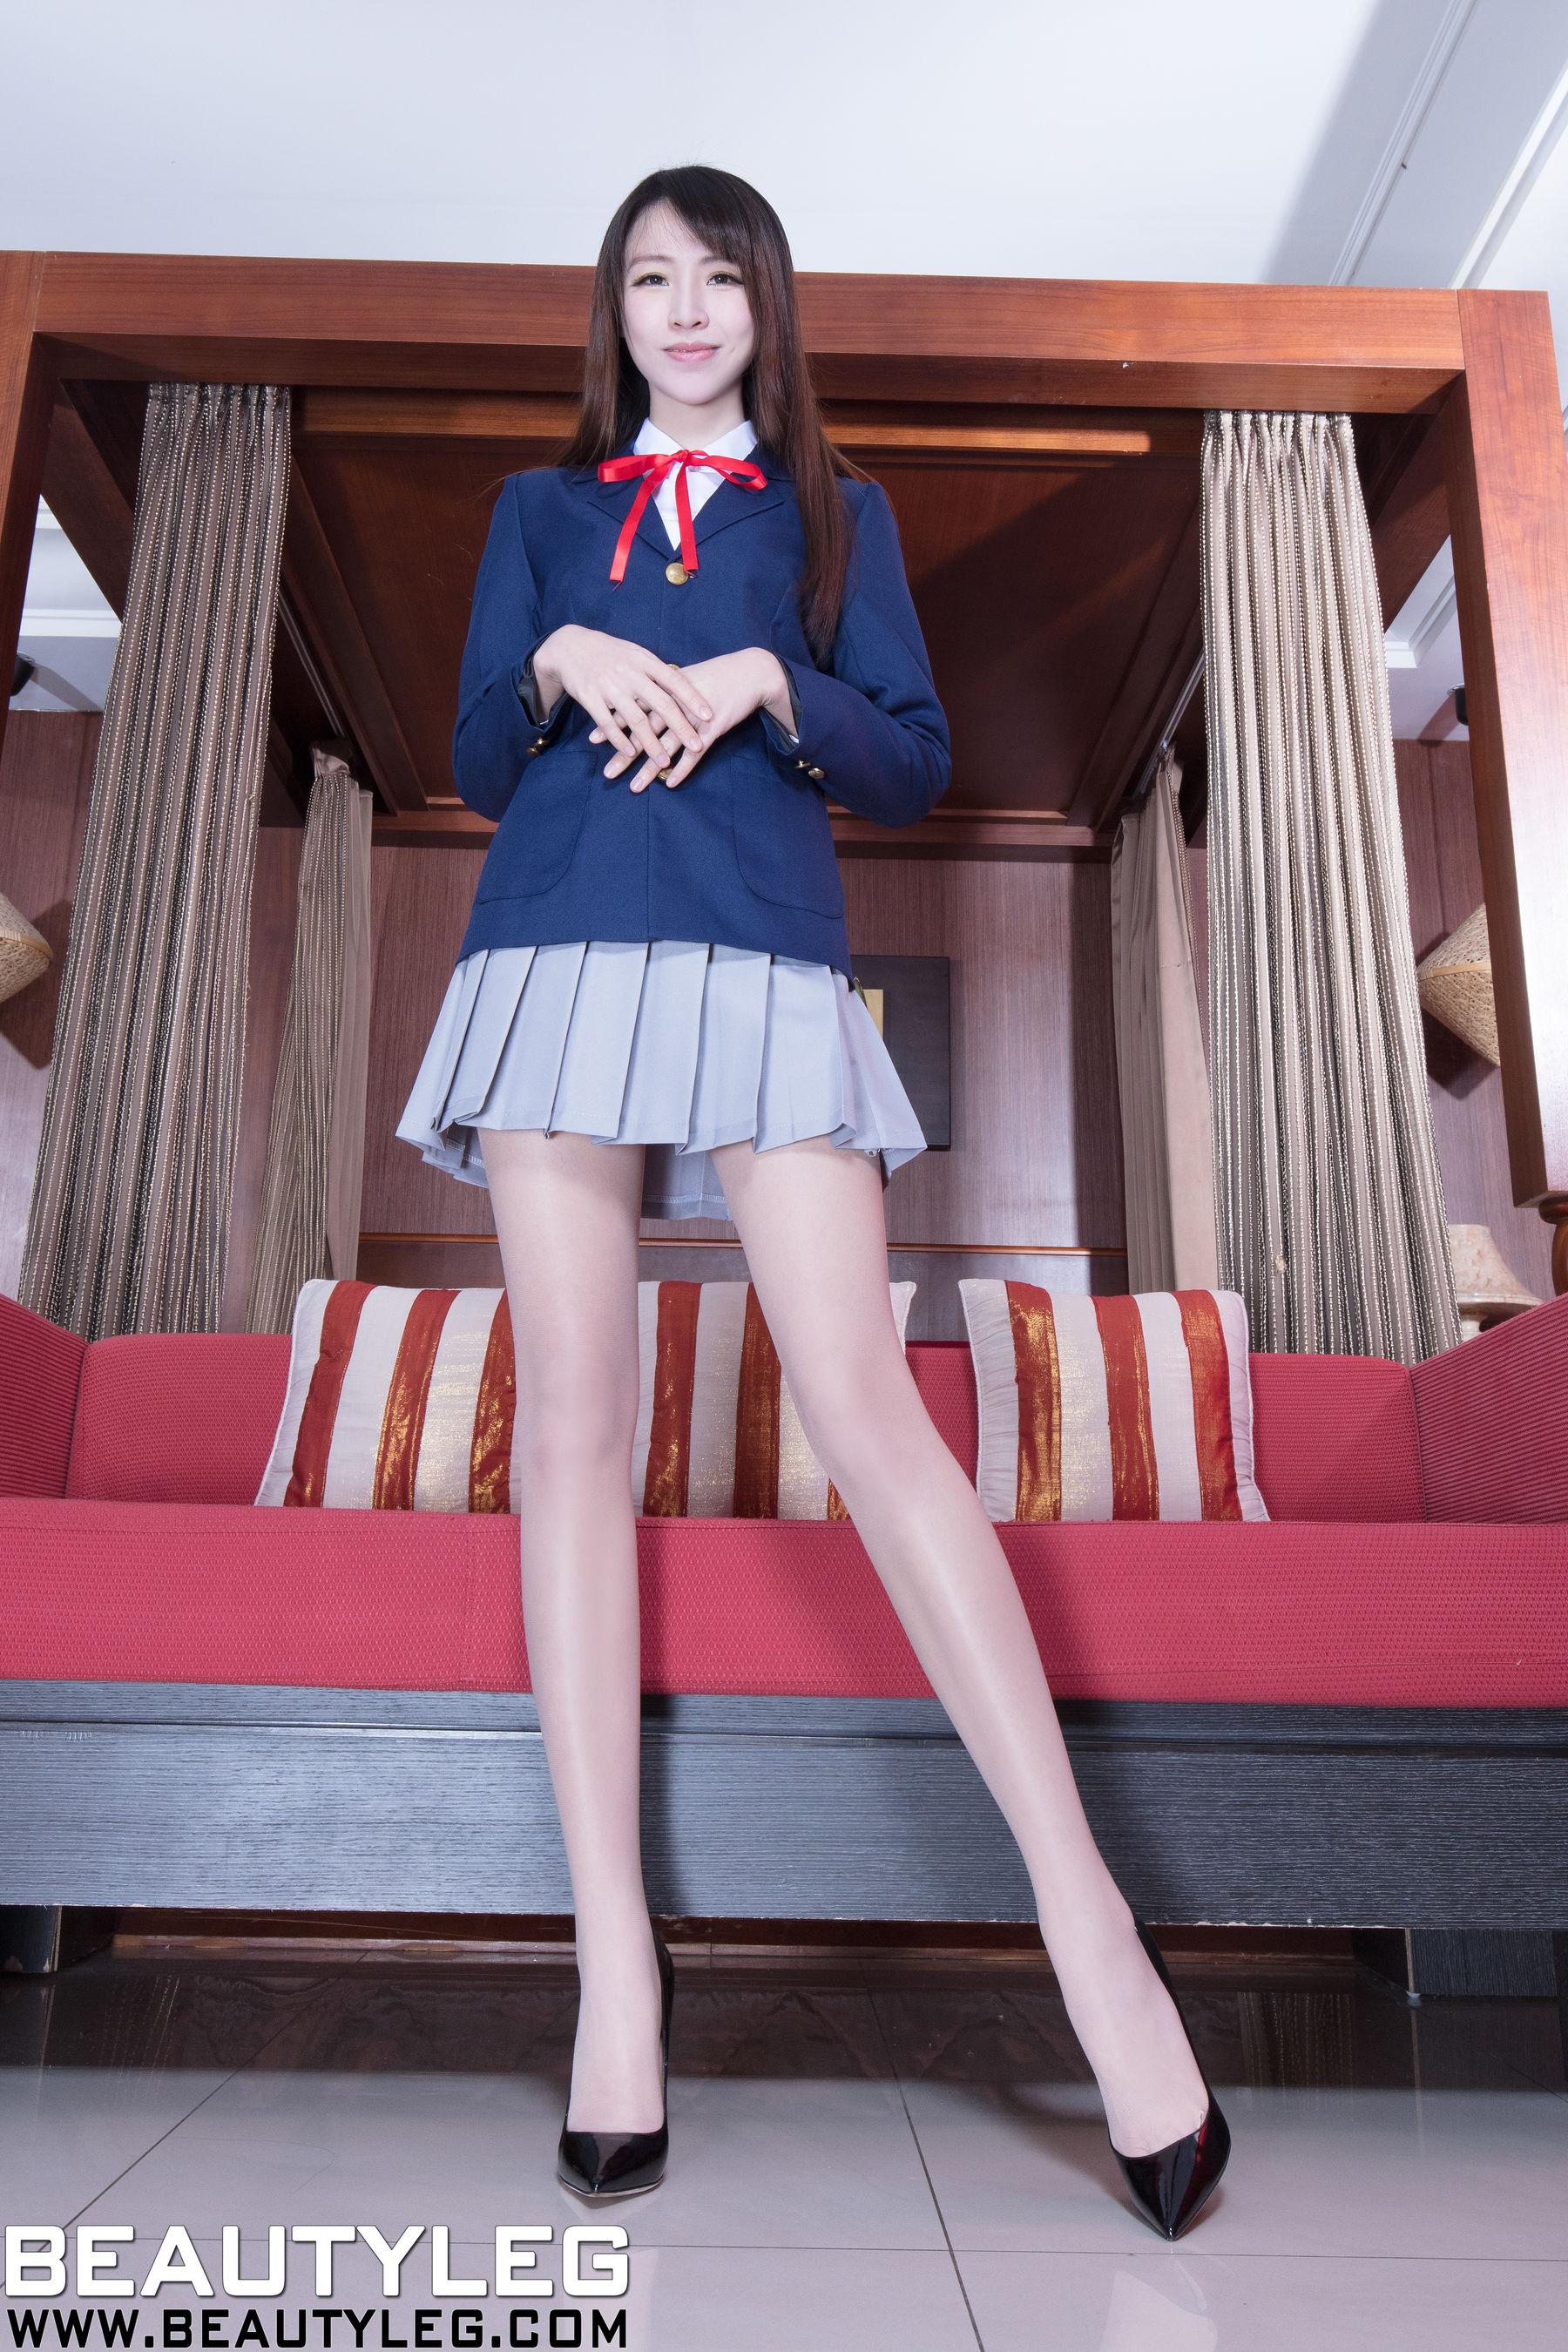 VOL.1749 [Beautyleg]制服长腿美女:腿模Nancy(Nancy)超高清个人性感漂亮大图(56P)